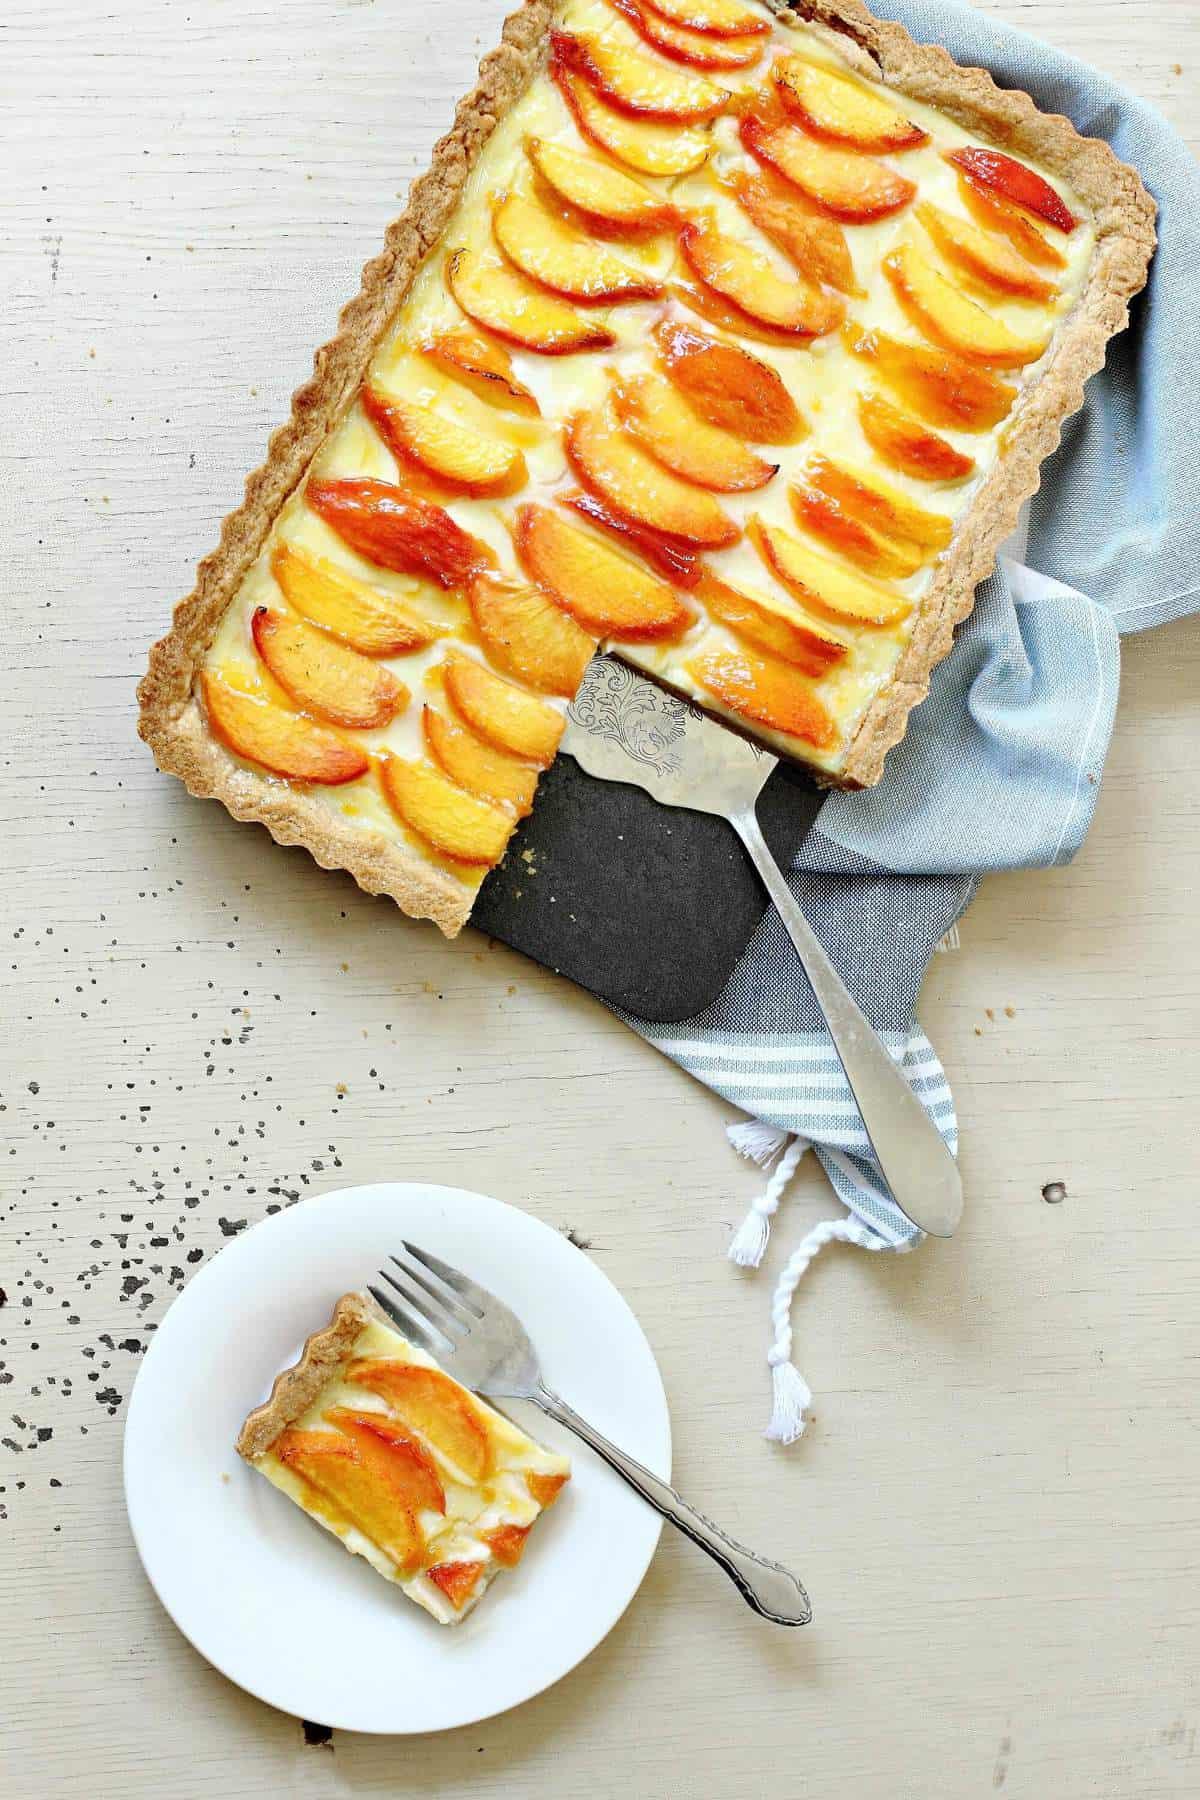 Peaches and Cream Custard Tart with a Rich Butter Crust